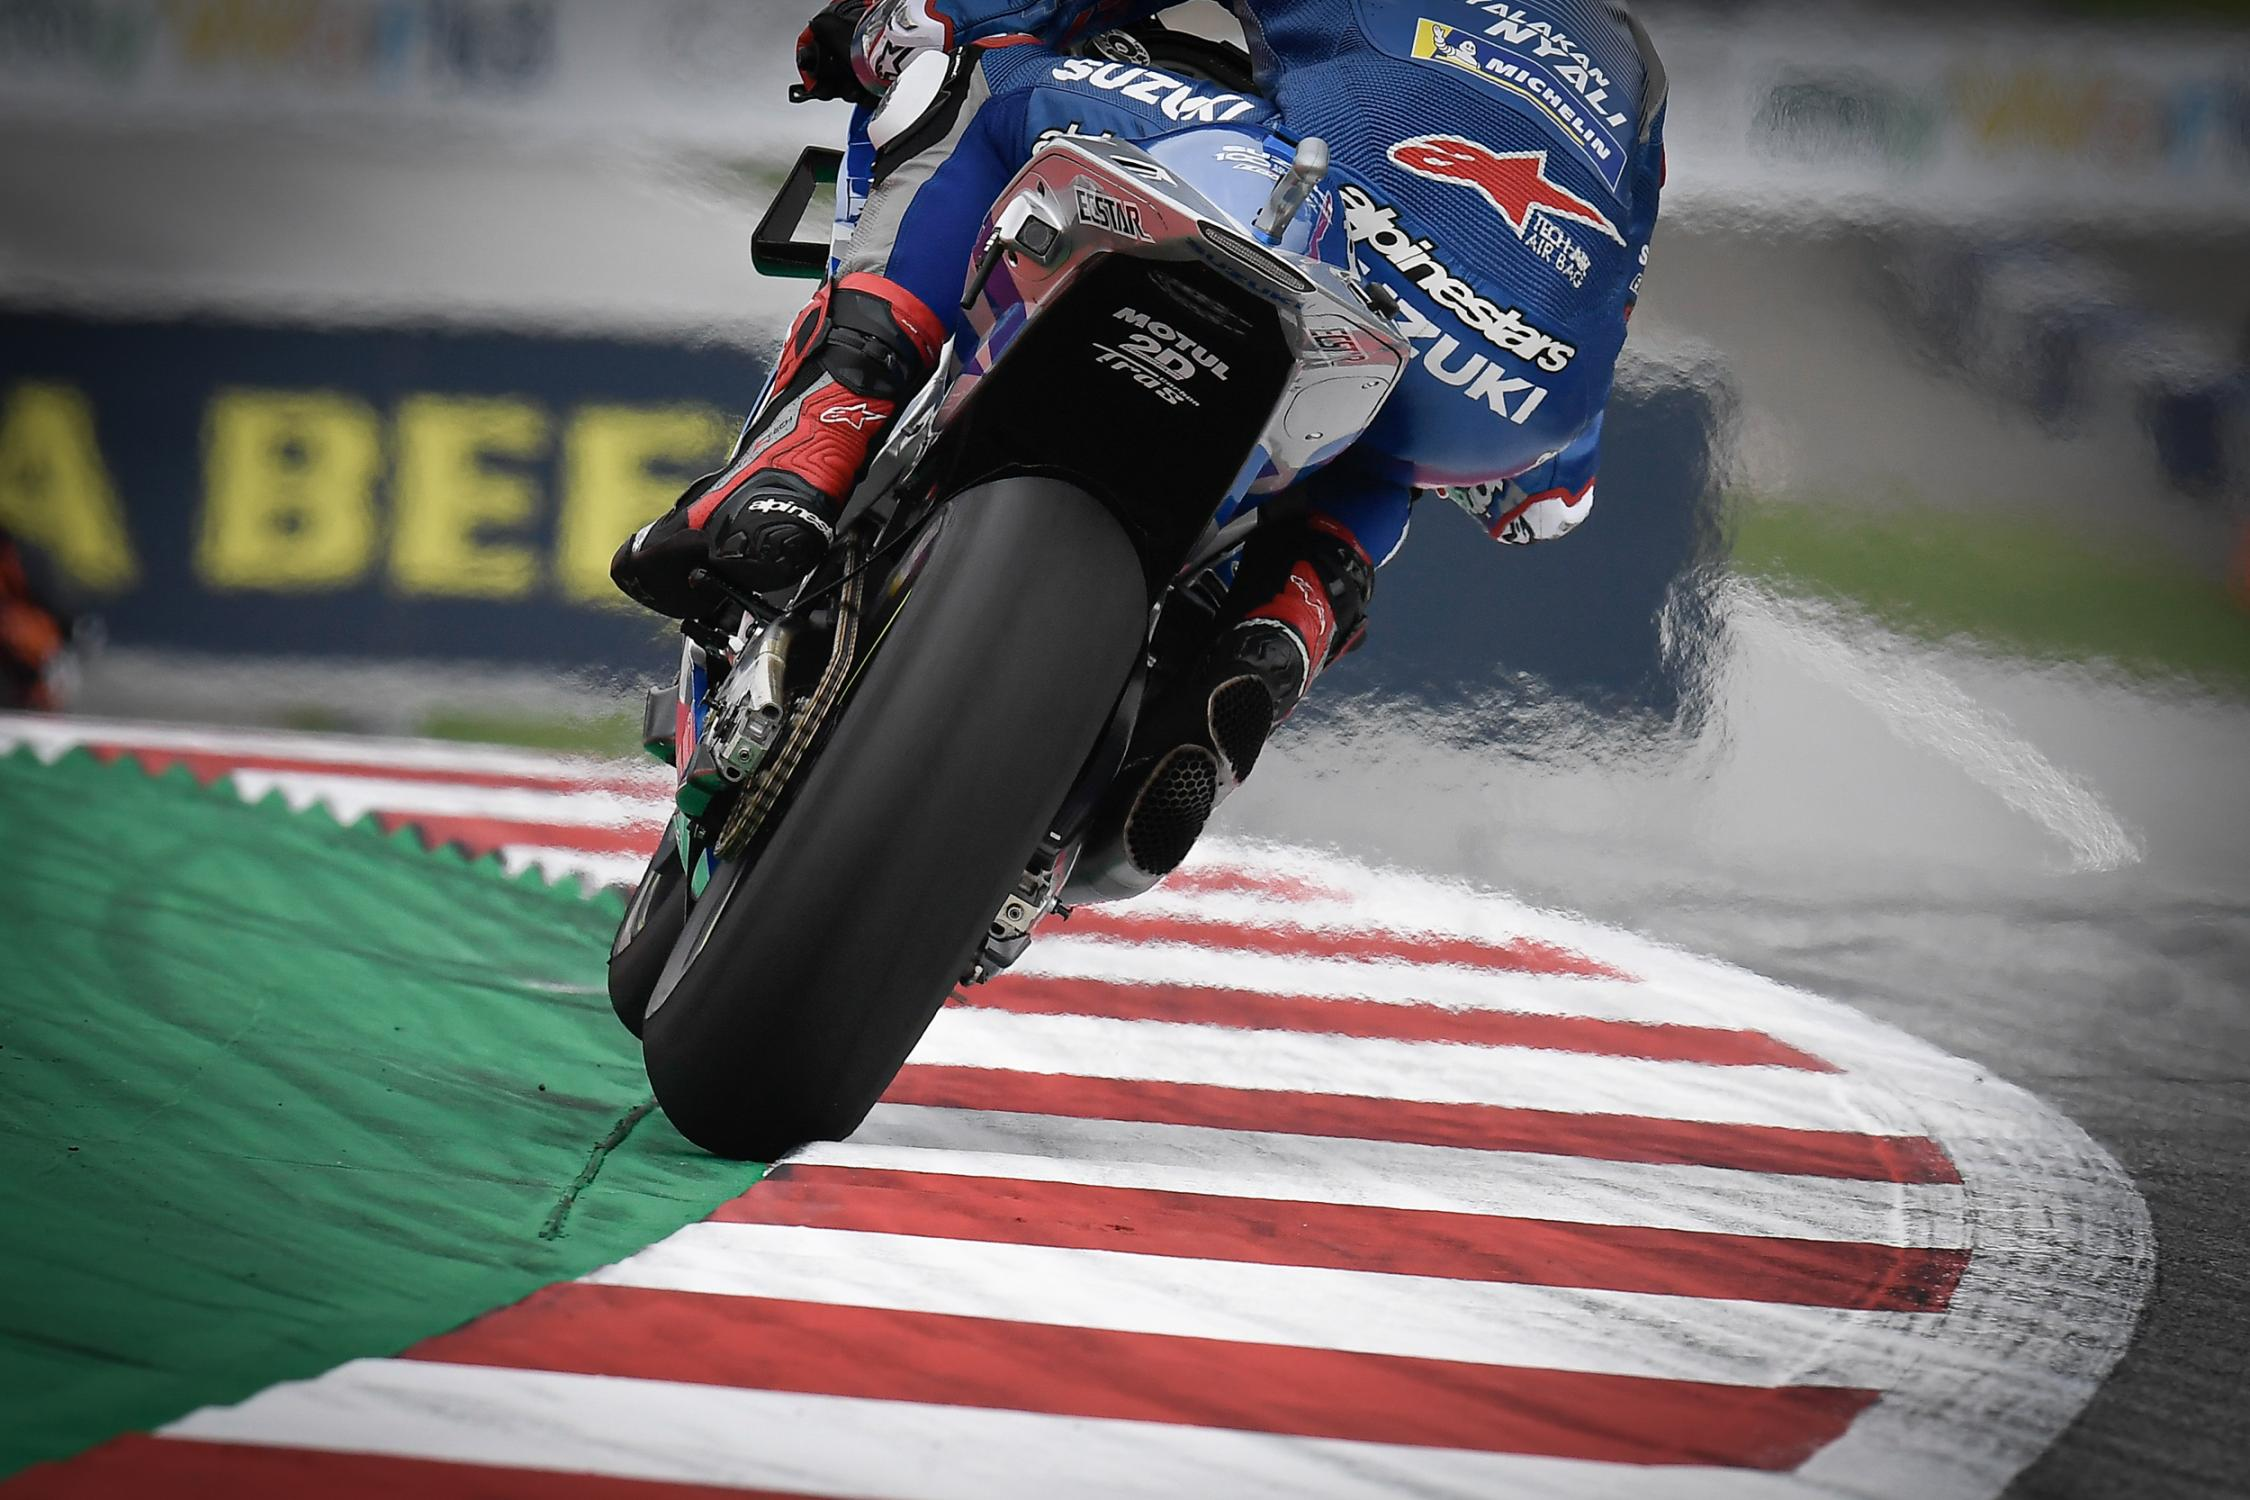 Rins estuvo cerca, pero falló Foto: MotoGP